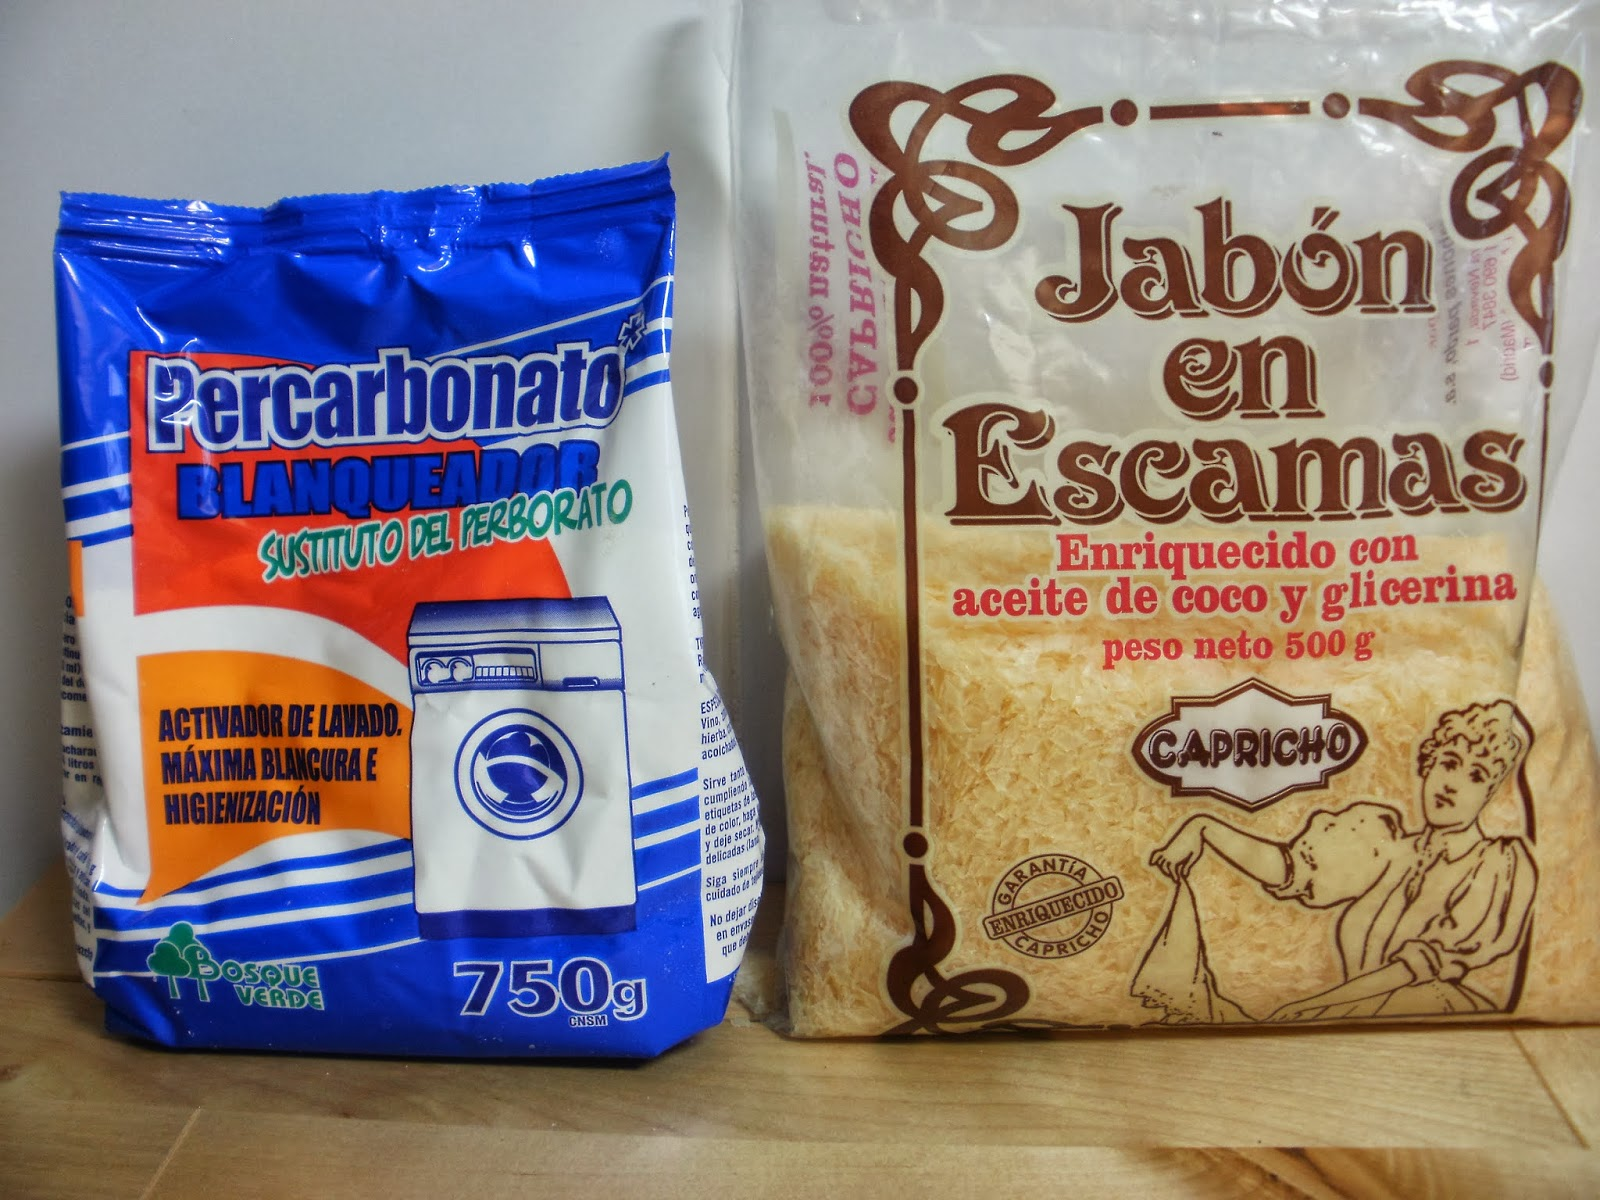 Compartendos soluci n jab n lavadora econ mico ecol gico - Jabon natural para lavadora ...